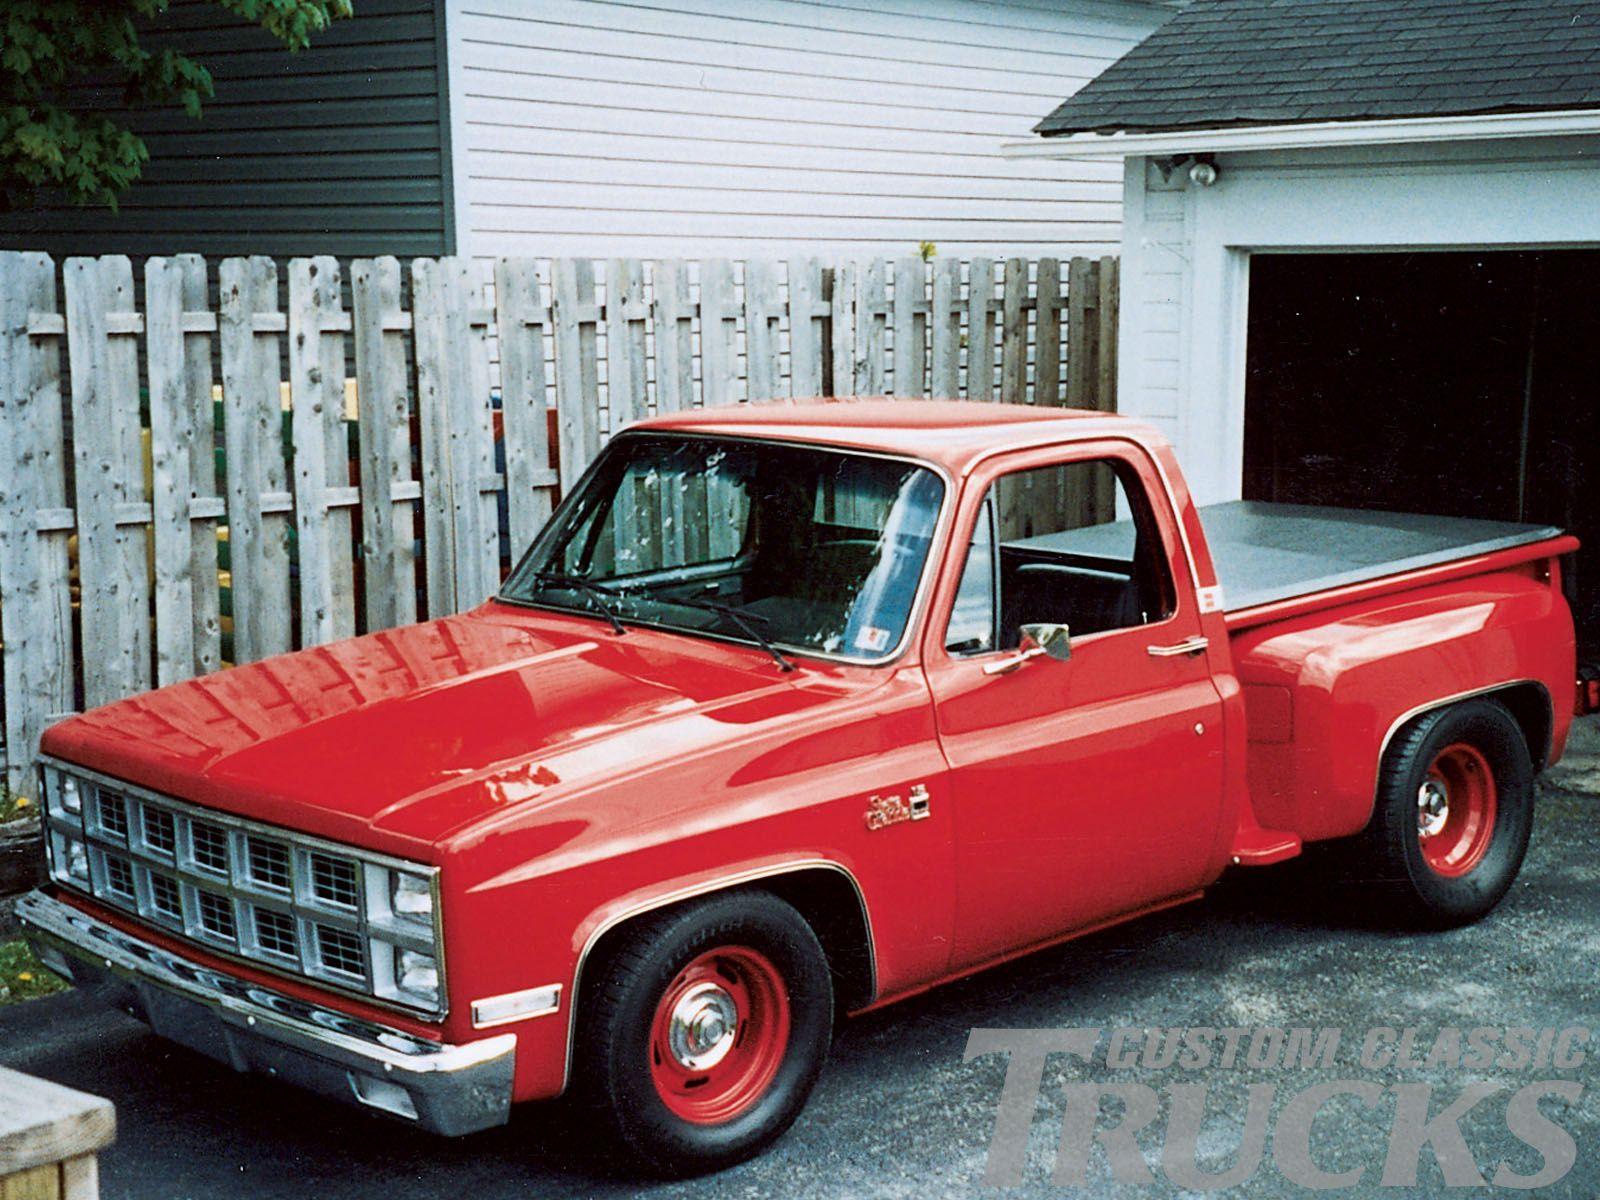 1982 gmc pickup truck photo 2 trucks pinterest gmc pickup trucks chevrolet and small trucks. Black Bedroom Furniture Sets. Home Design Ideas